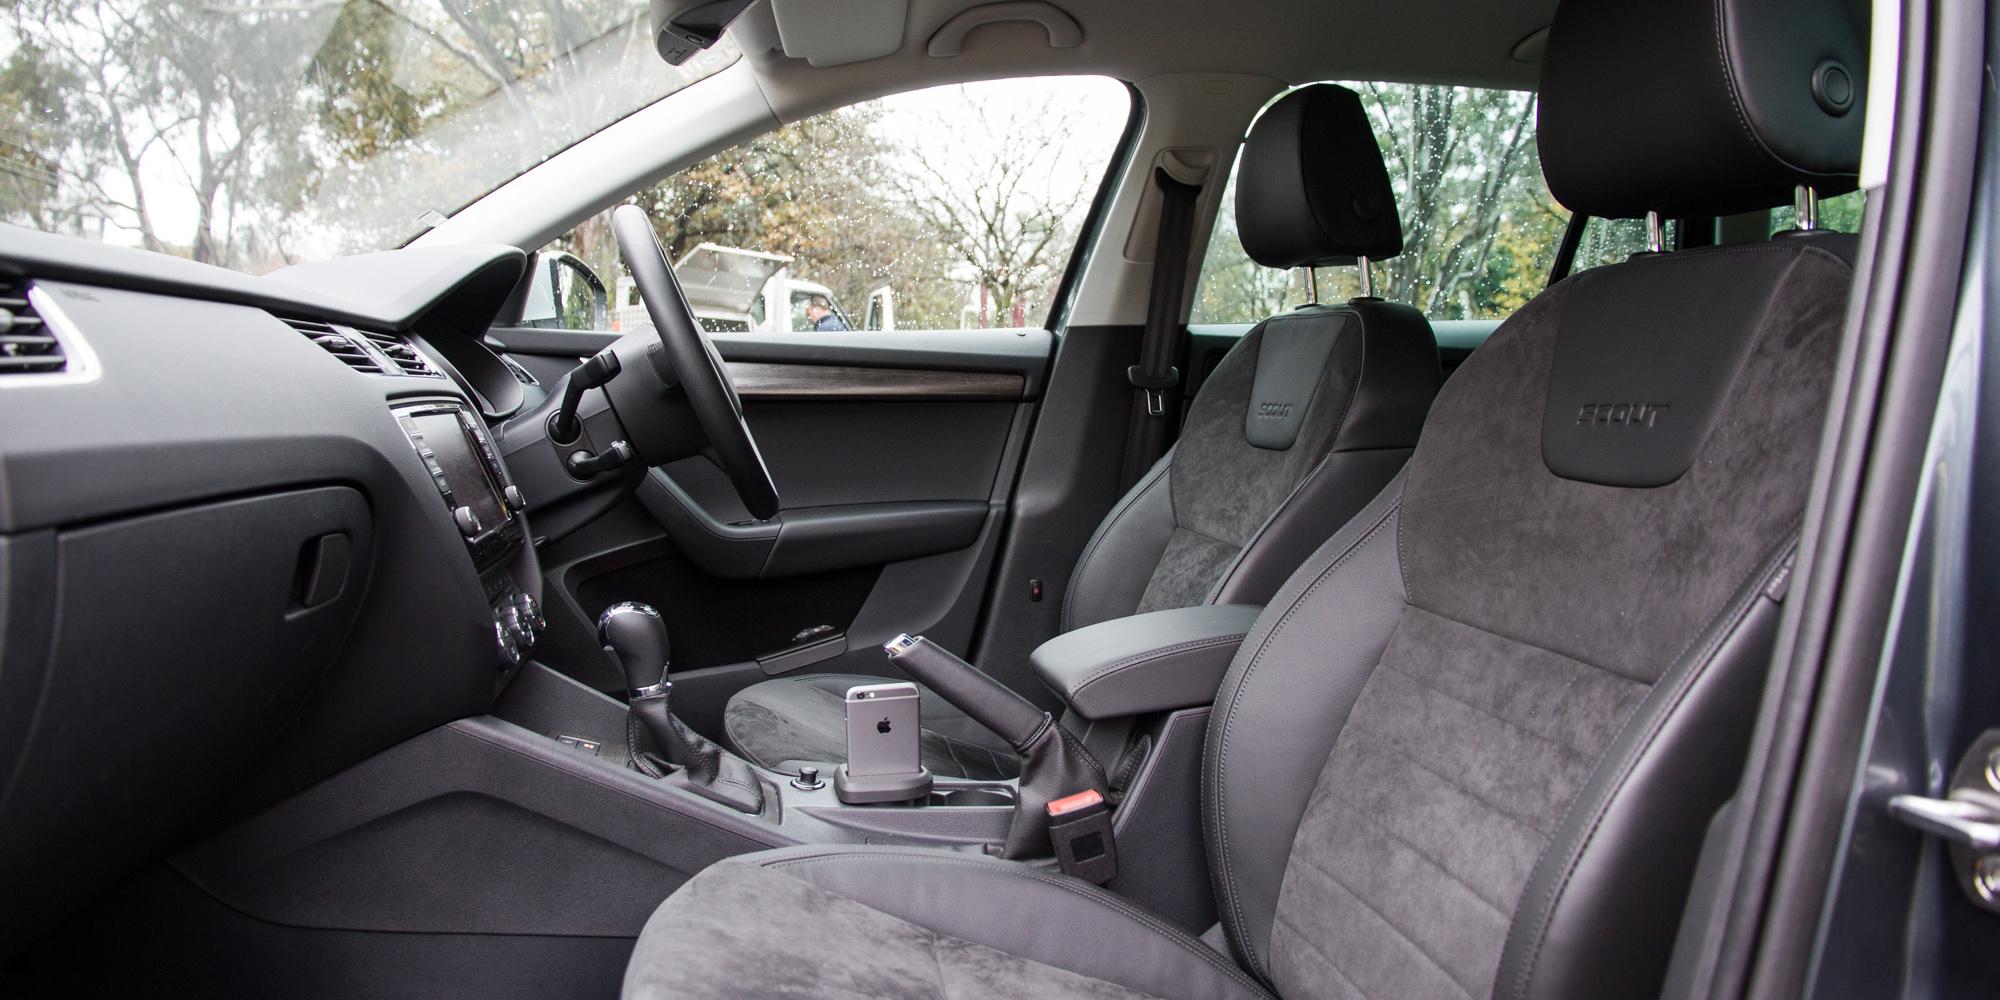 2016 Skoda Octavia Scout Interior Front Passenger Seat